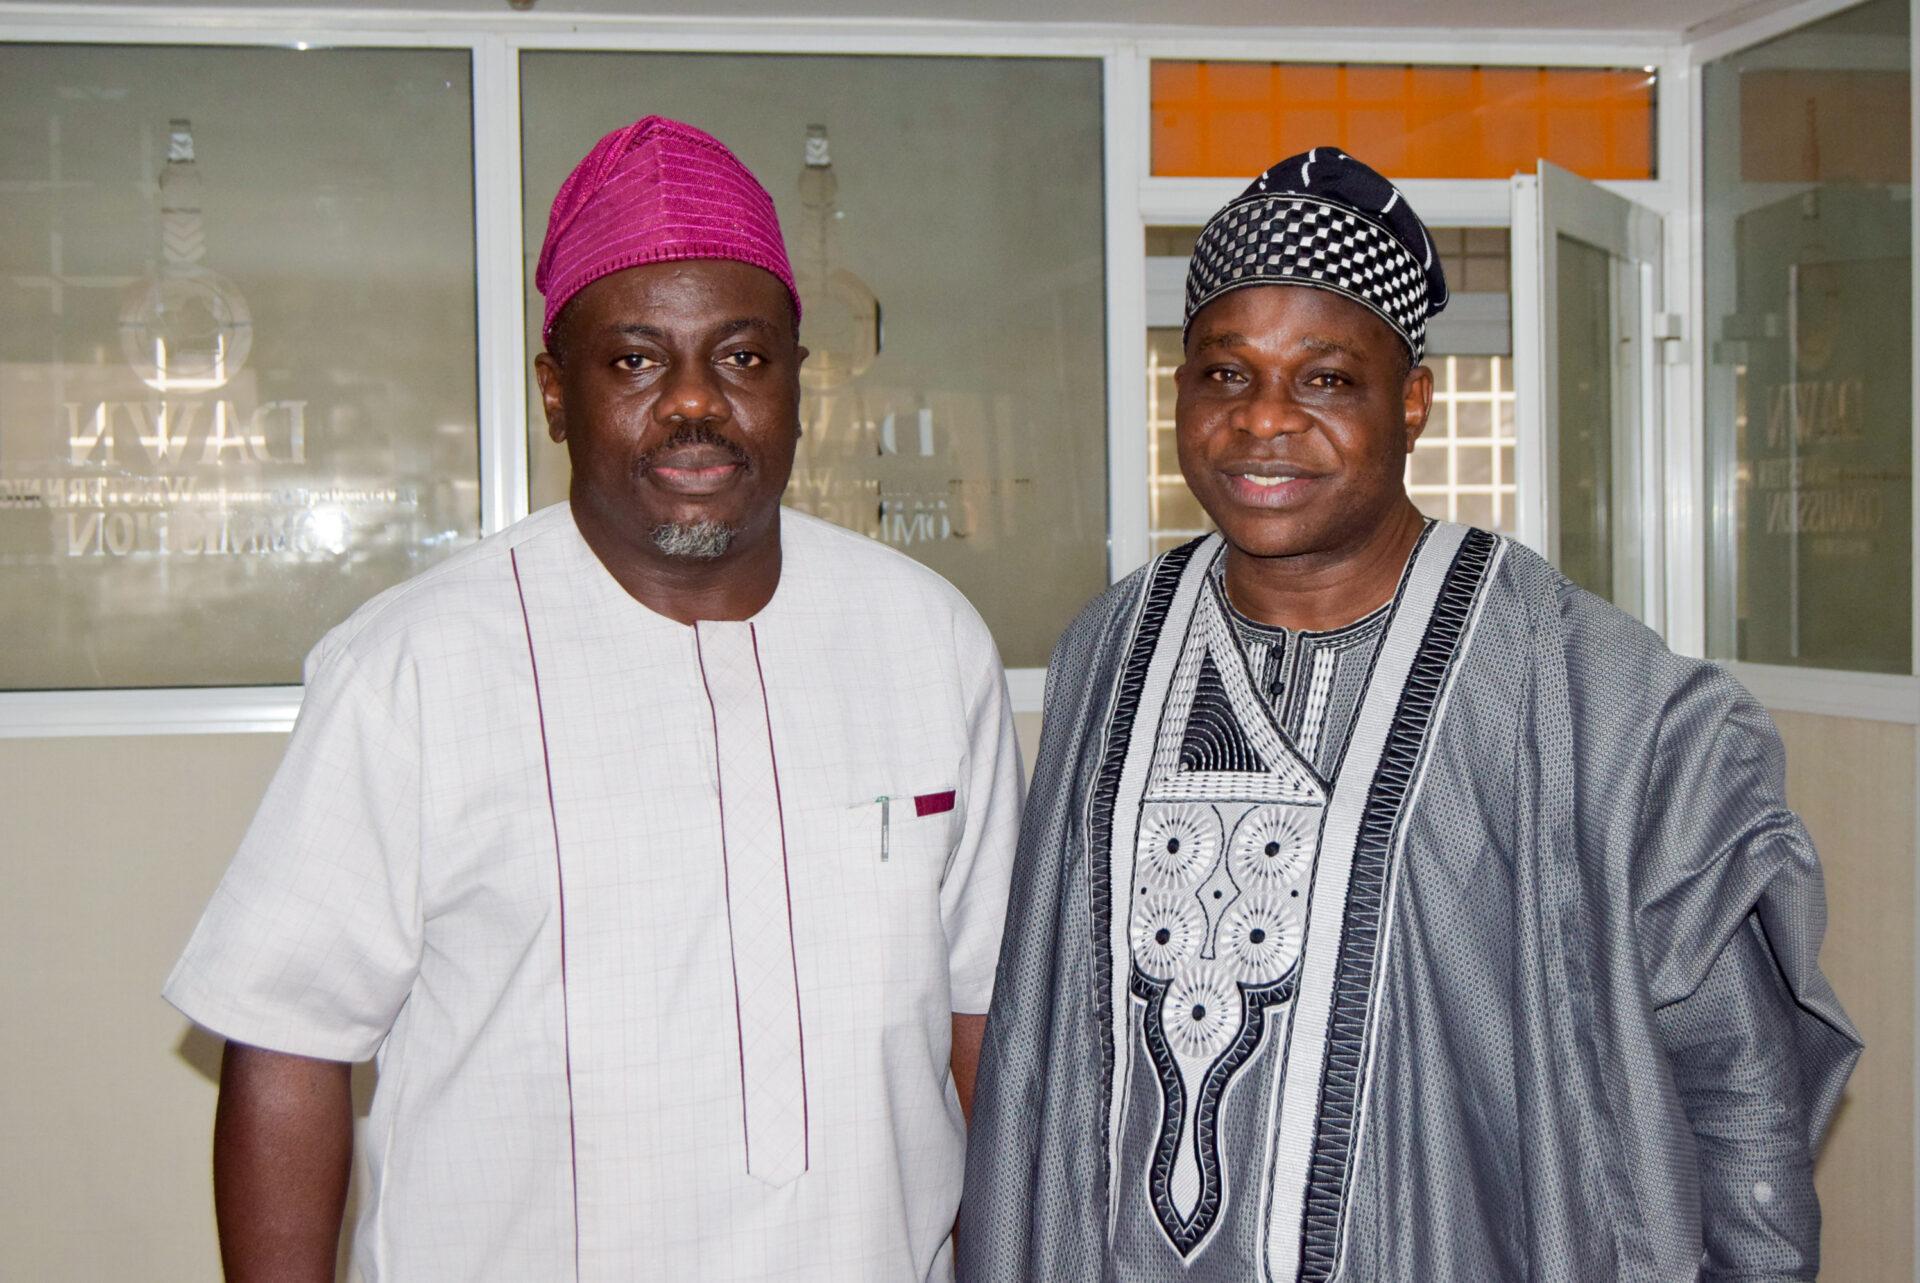 DG Seye Oyeleye, Amb. Oguntuase visits DAWN 4